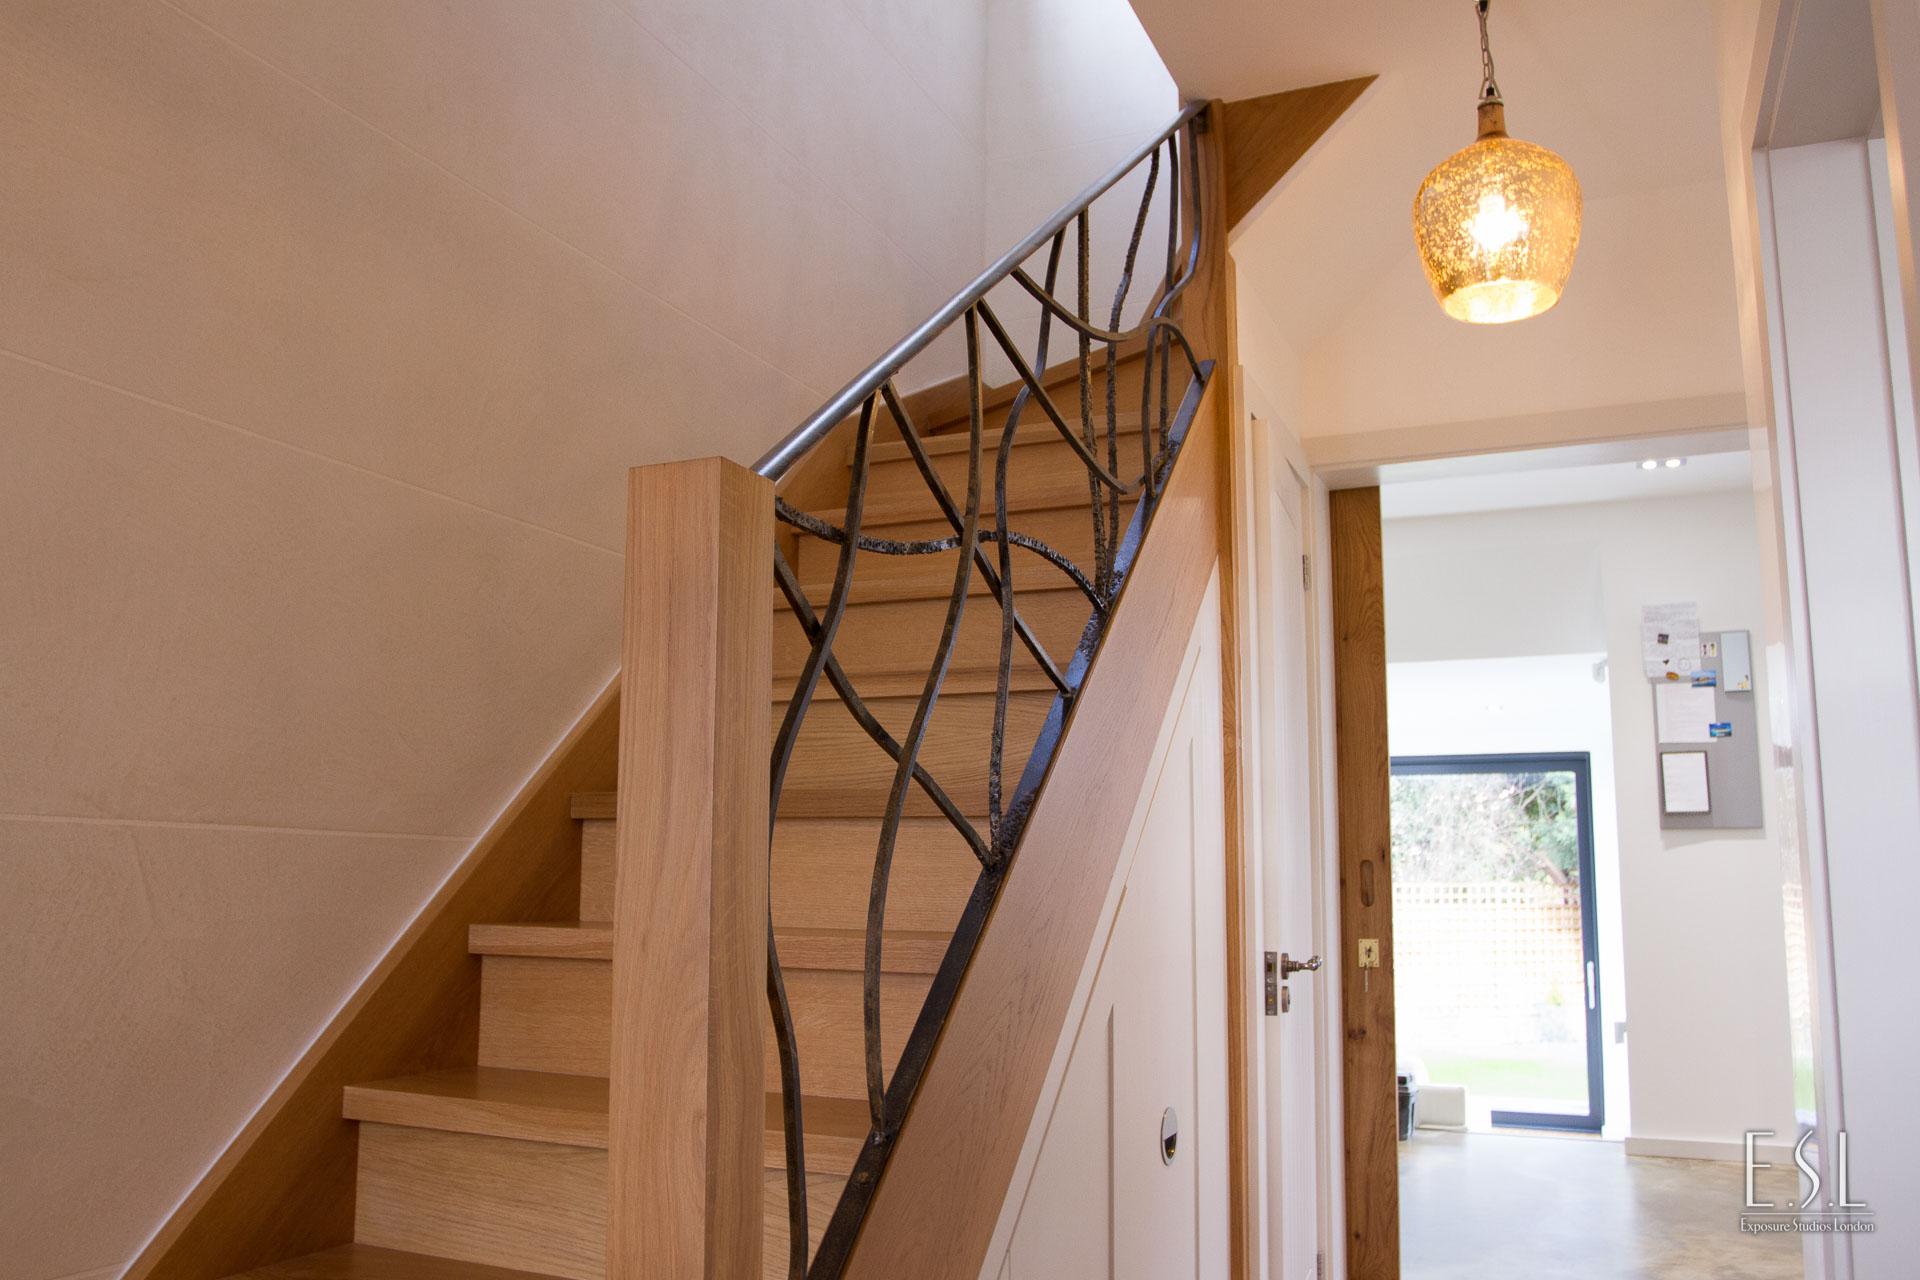 Builders, Winchmore Hill, London House rennovation & Refurbishment 16